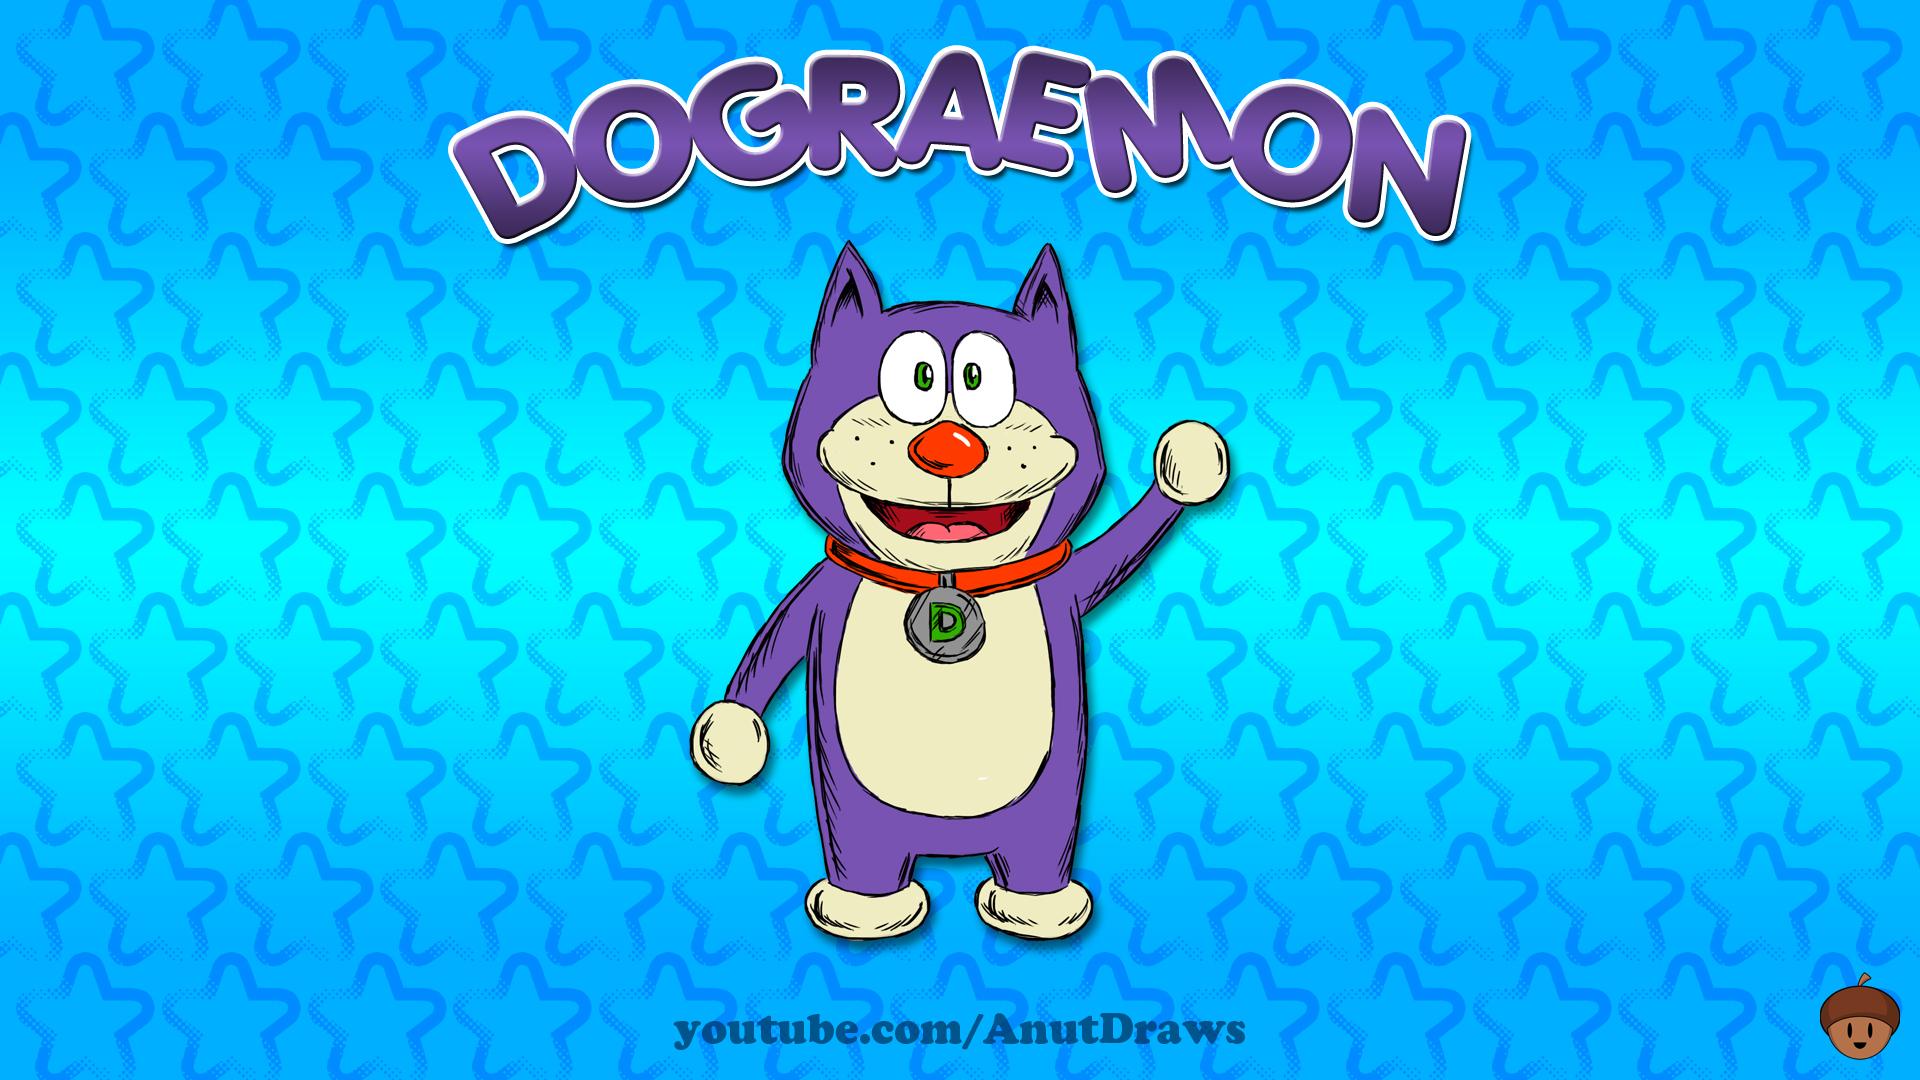 Dograemon by AnutDraws